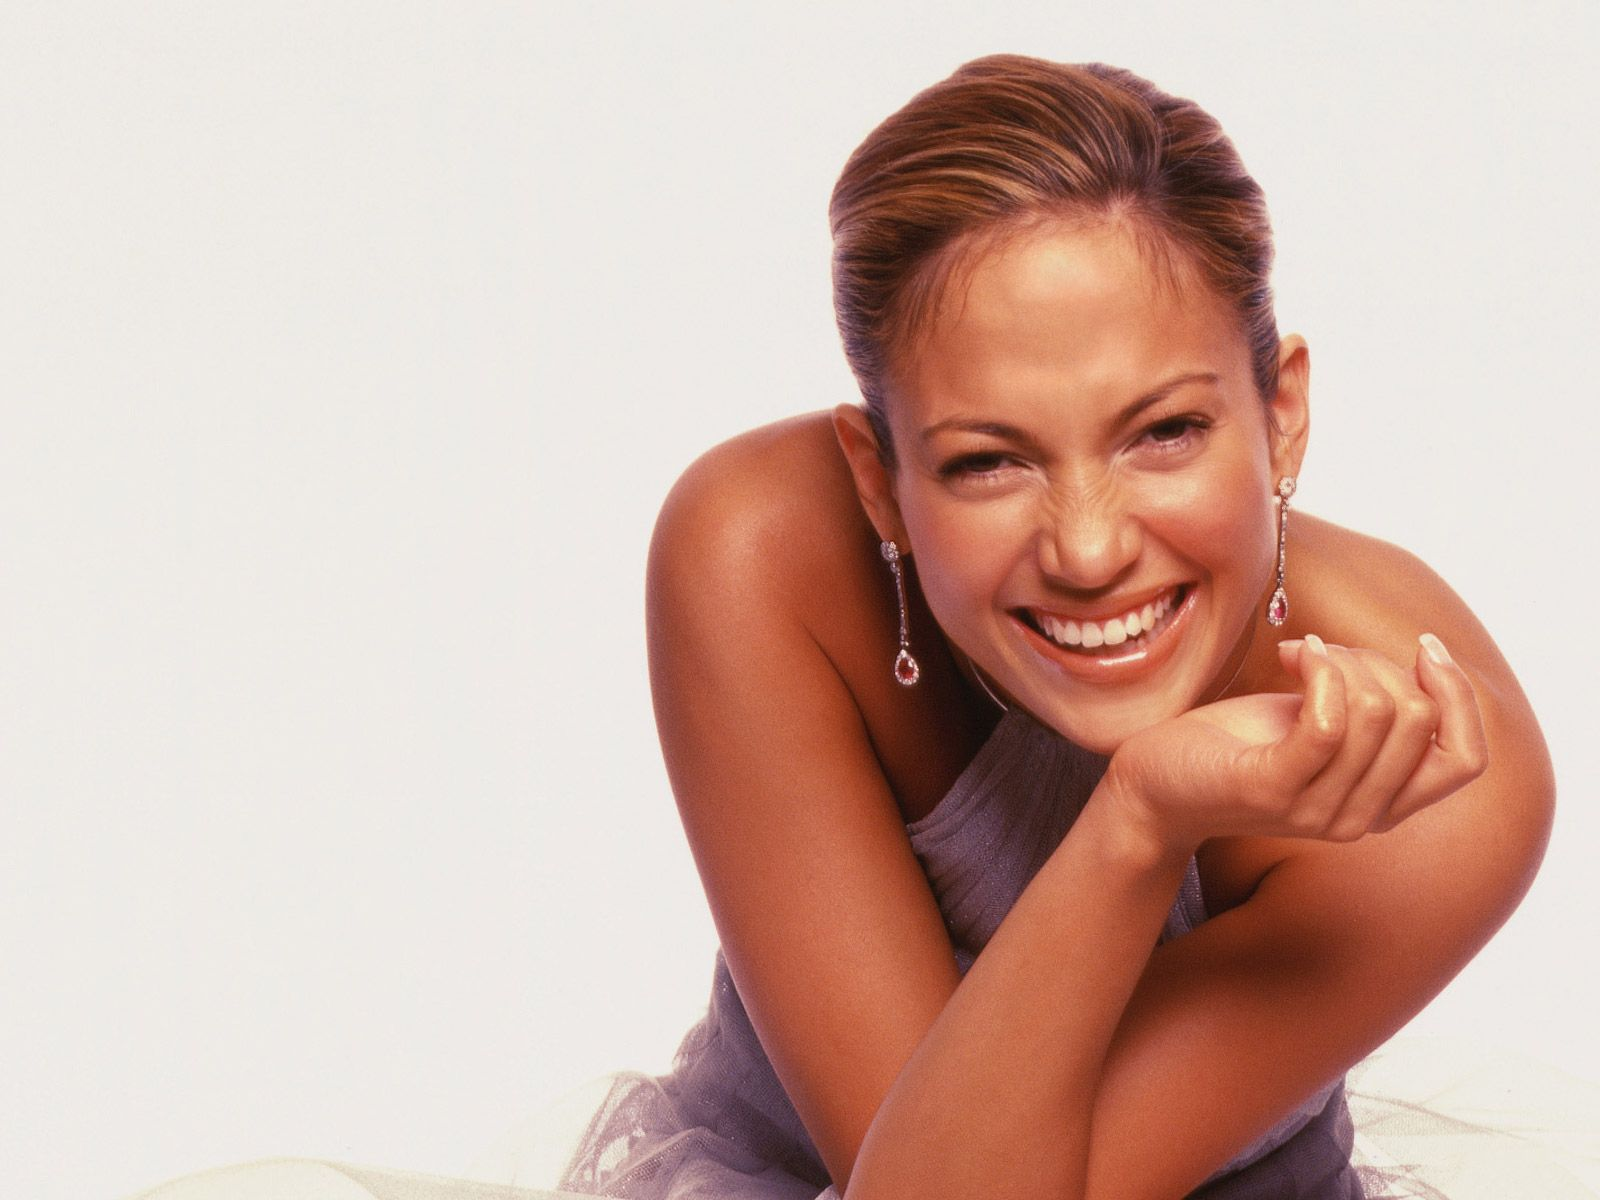 http://4.bp.blogspot.com/-8bT2zOfkpdk/UKOVCbg-dWI/AAAAAAAAA8Y/gh0TTlQ0wg8/s1600/Jennifer+Lopez+HD+2012+Wallpapers+1600+X+1200+(2).jpg